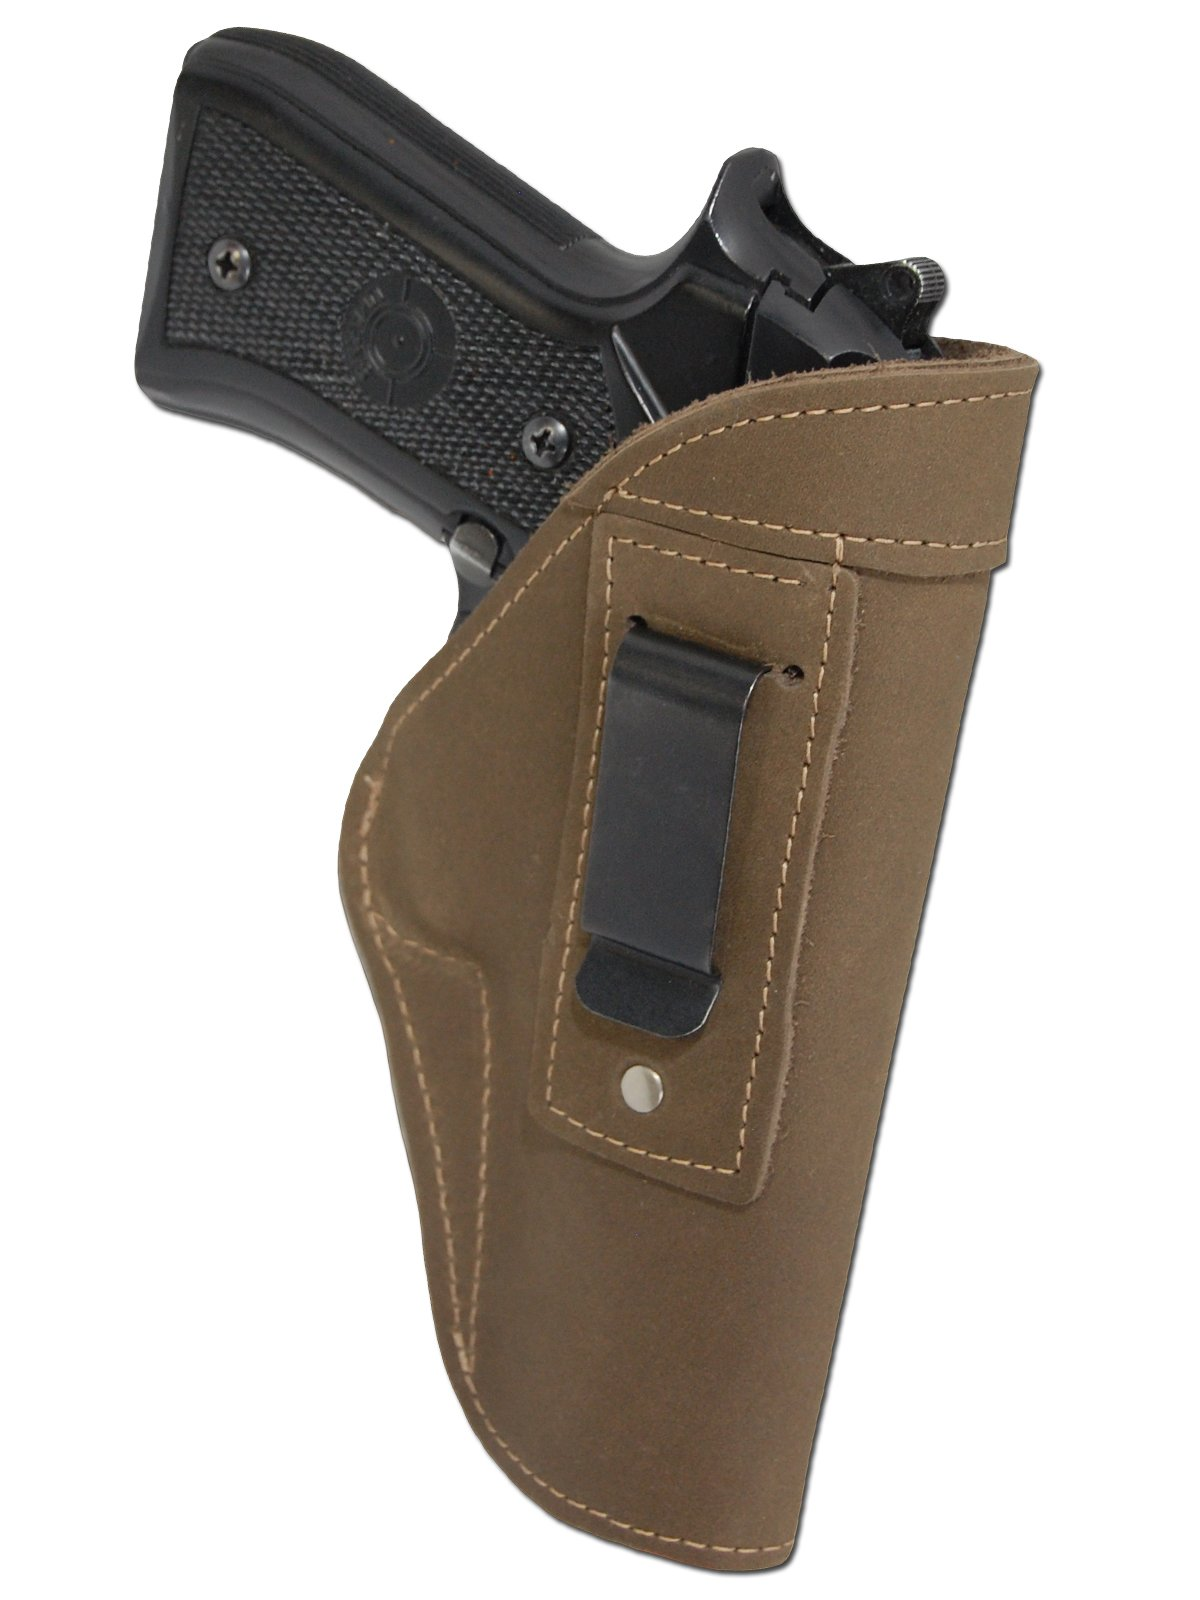 Barsony New Olive Drab Leather Gun IWB Holster for Full Size 9mm 40 45